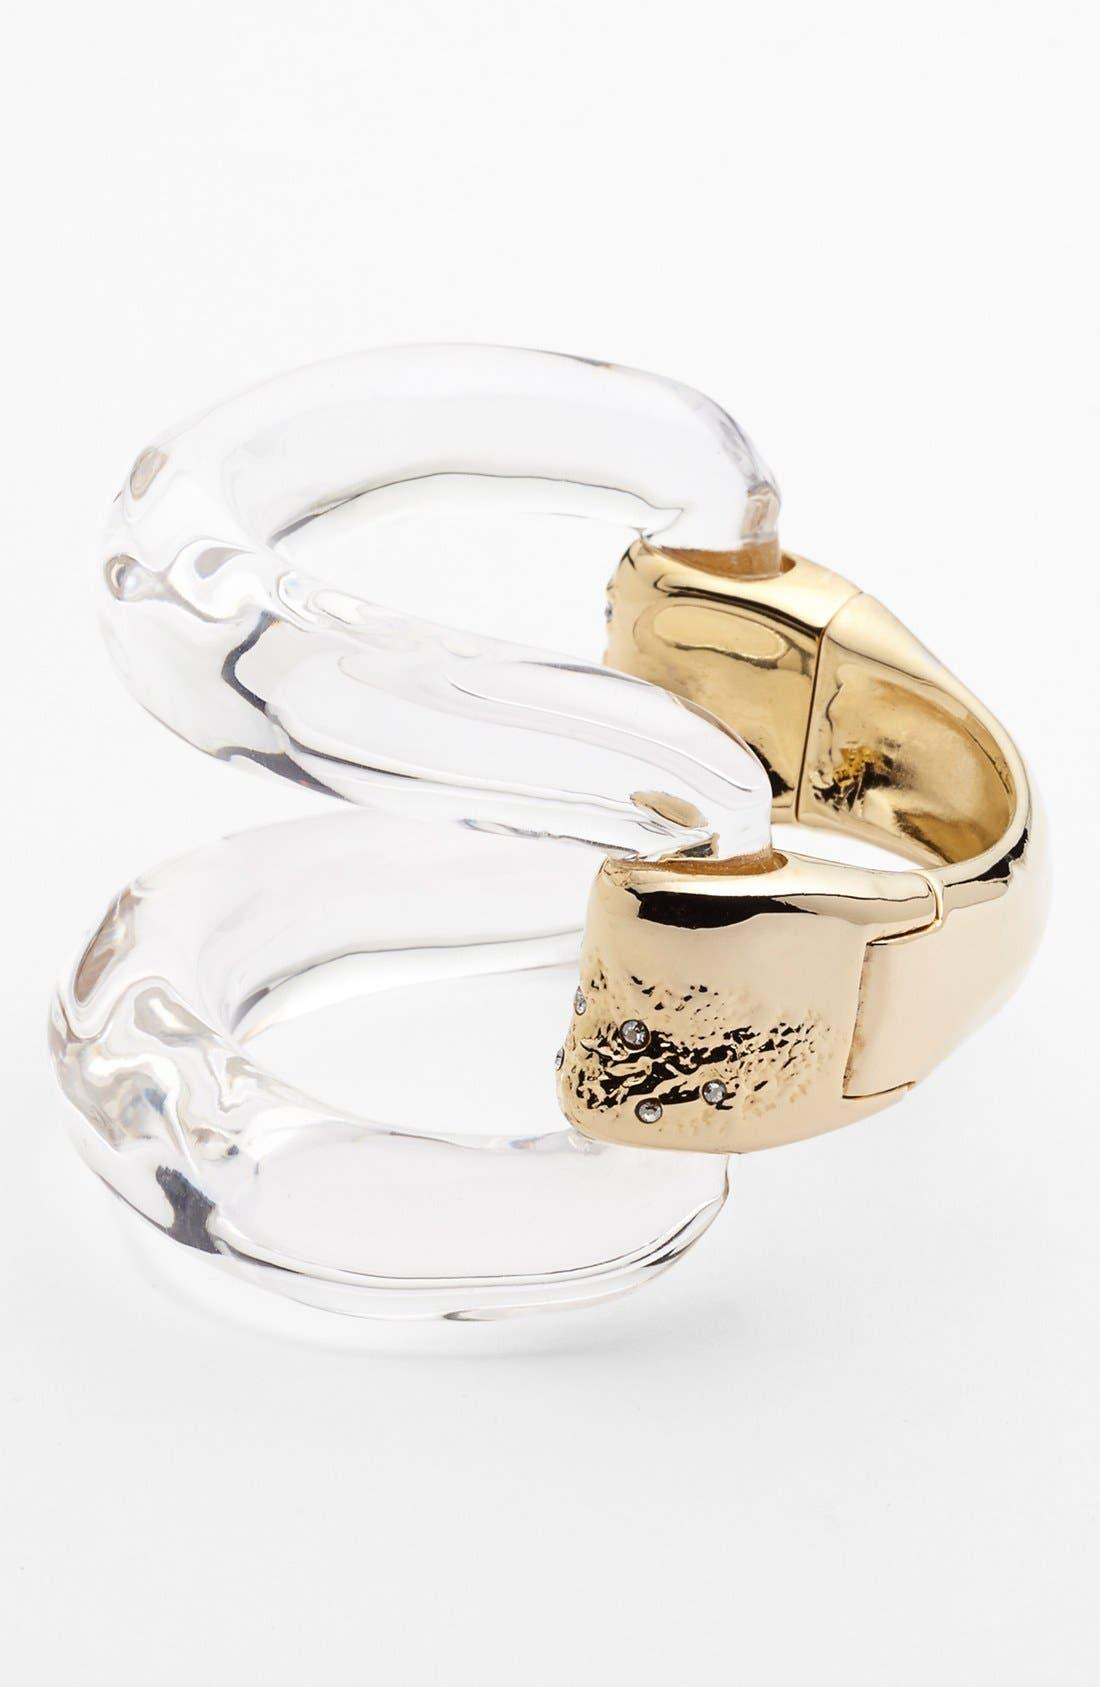 Alternate Image 1 Selected - Alexis Bittar 'Lucite®' Open Statement Bracelet